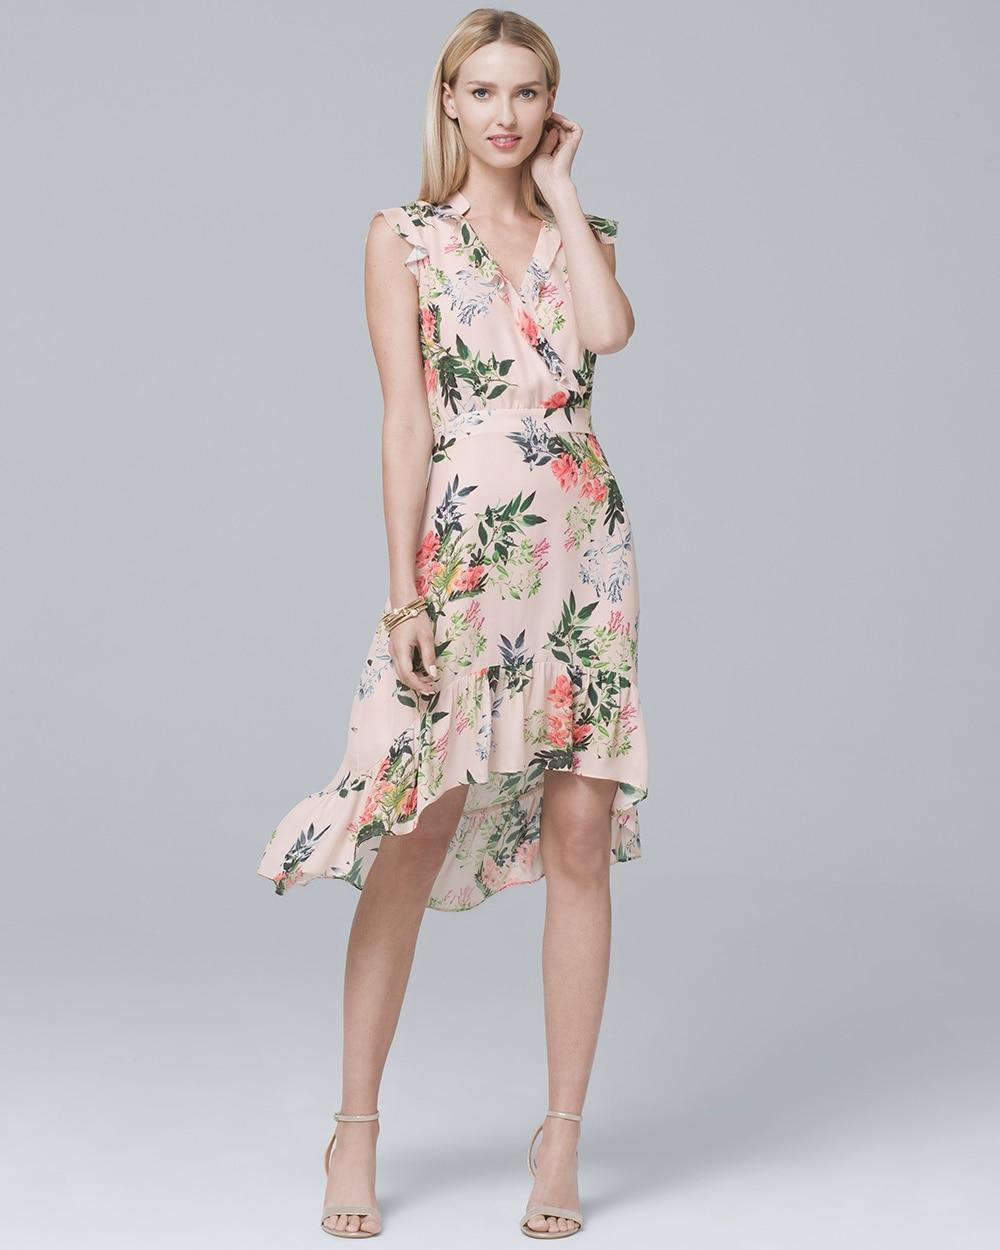 Silk Ruffle Trim Floral Dress White House Black Market